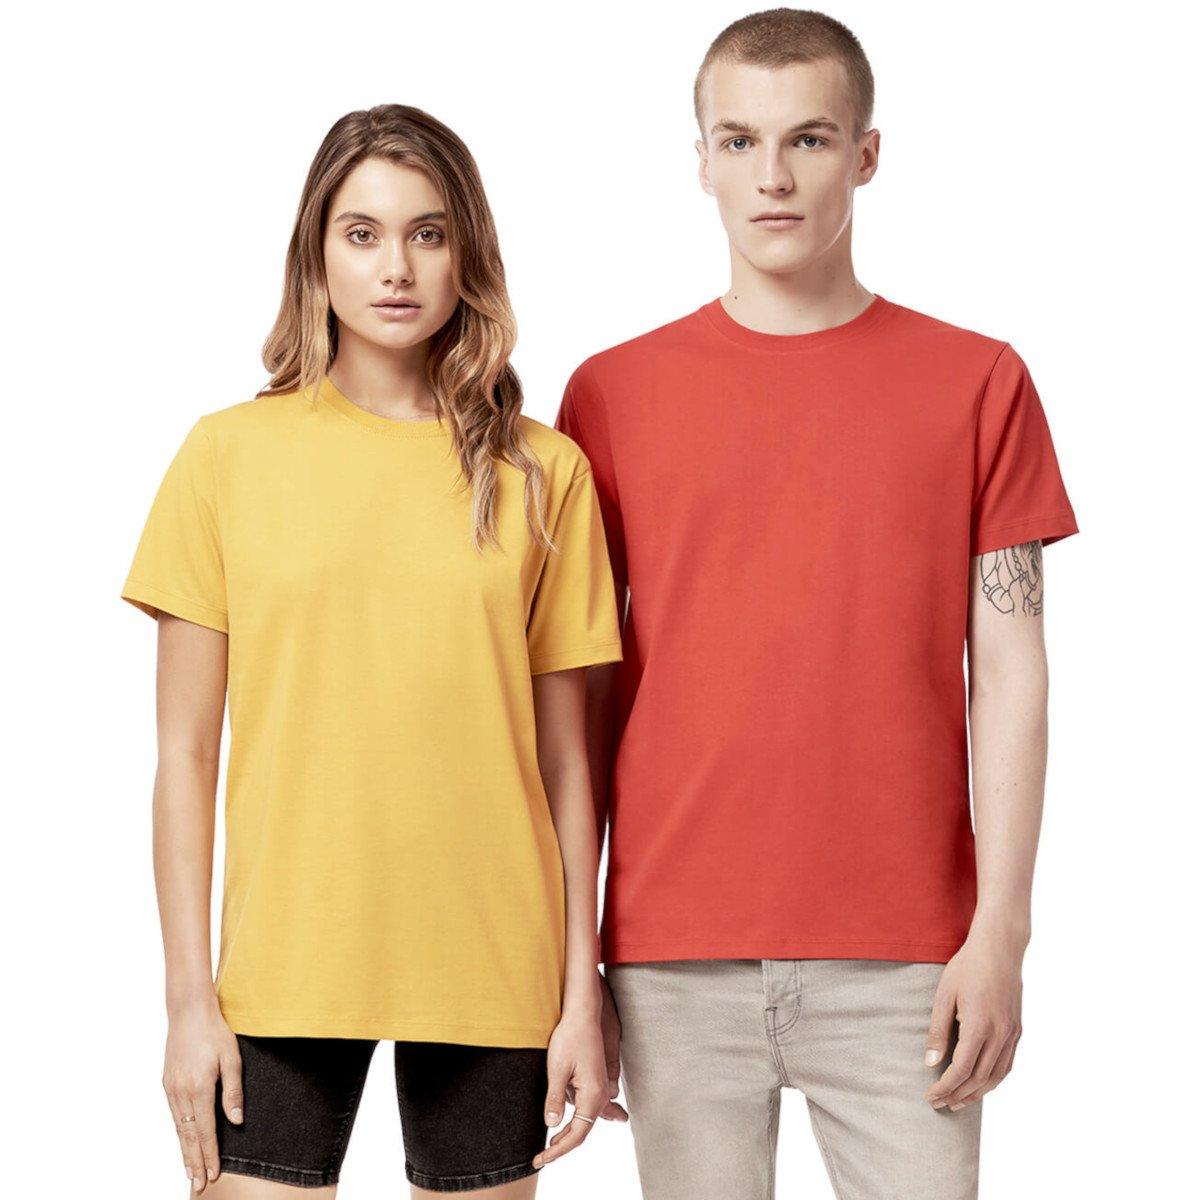 Unisex t-shirt Warm colors in organic cotton